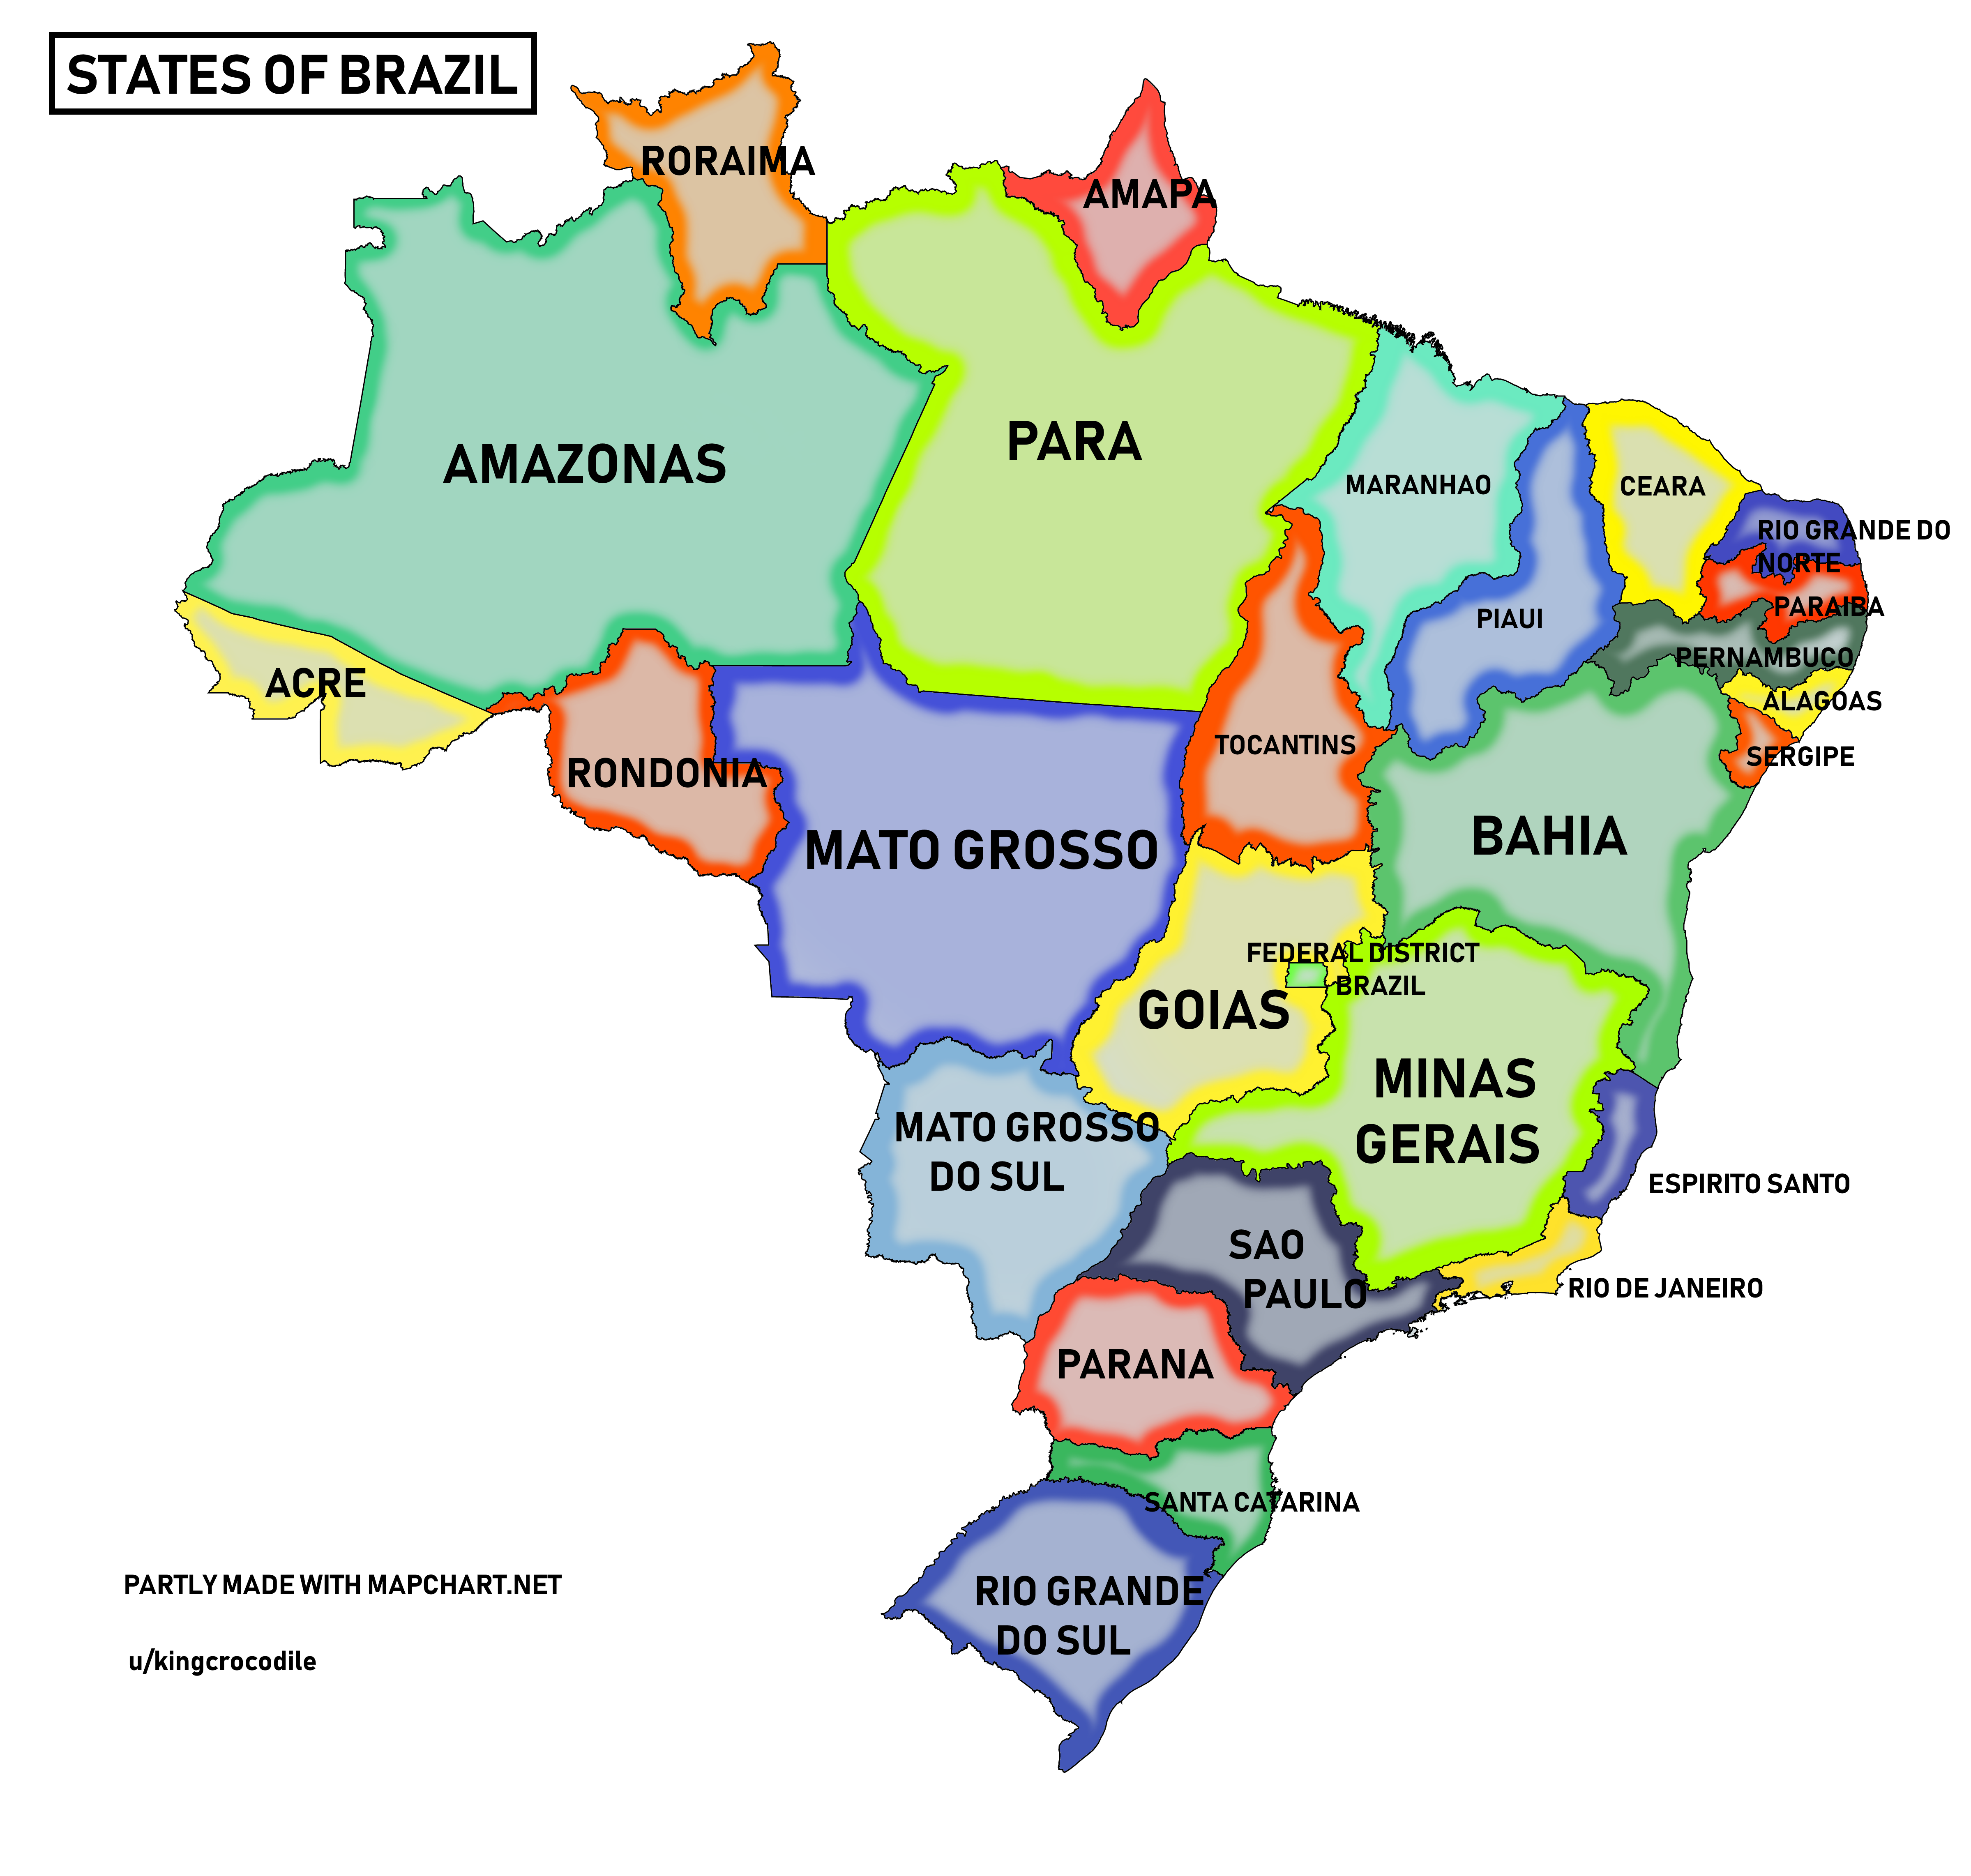 States Of Brazil Paises Apuntes